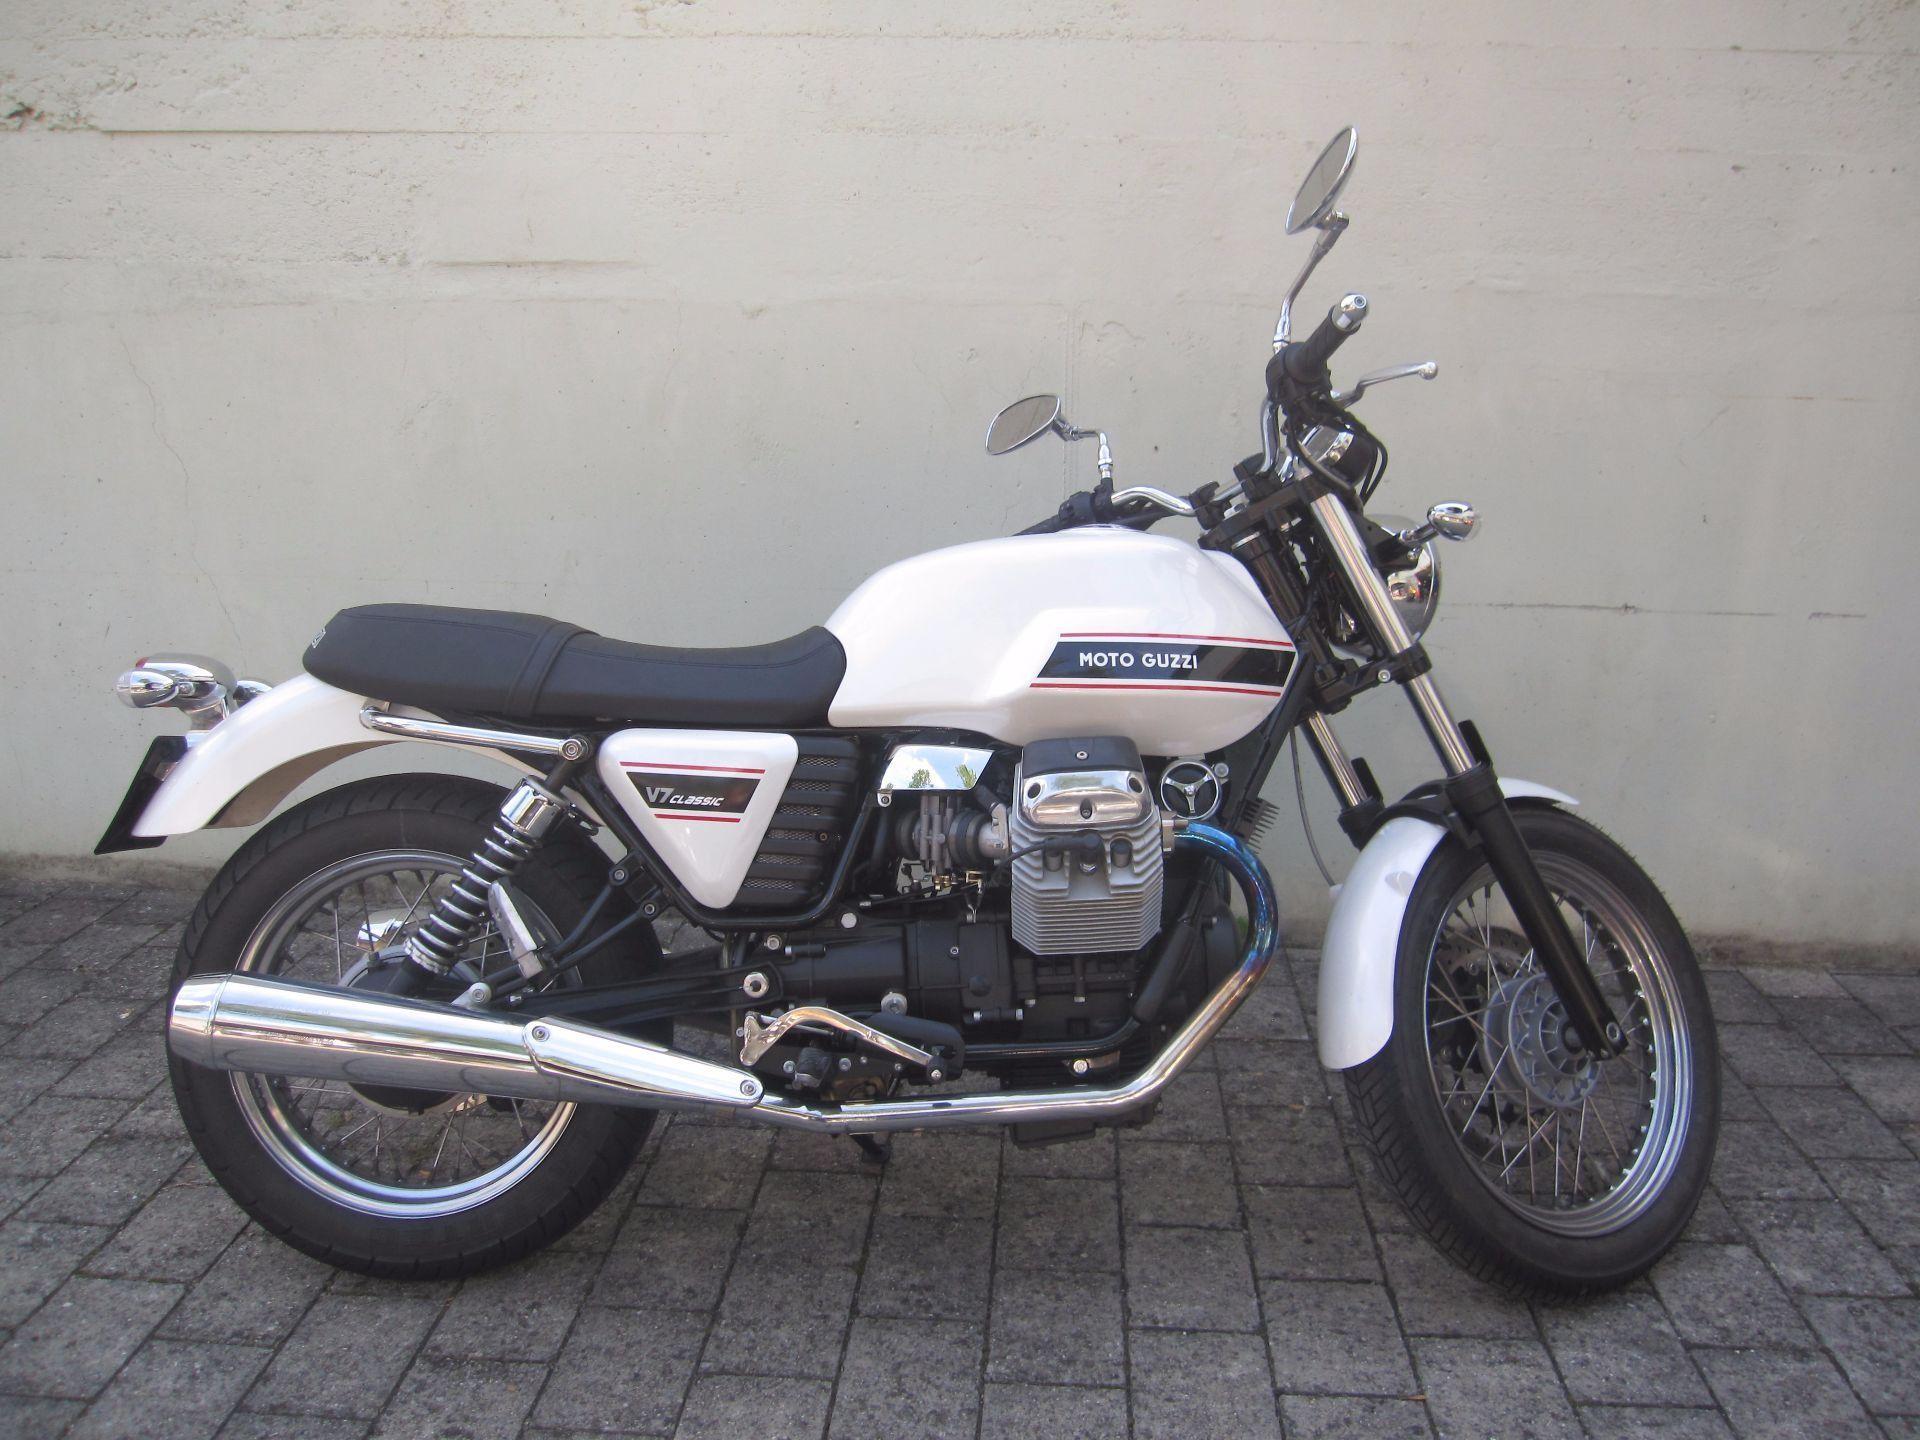 motorrad occasion kaufen moto guzzi v7 750 classic t ff huus moosleerau moosleerau. Black Bedroom Furniture Sets. Home Design Ideas